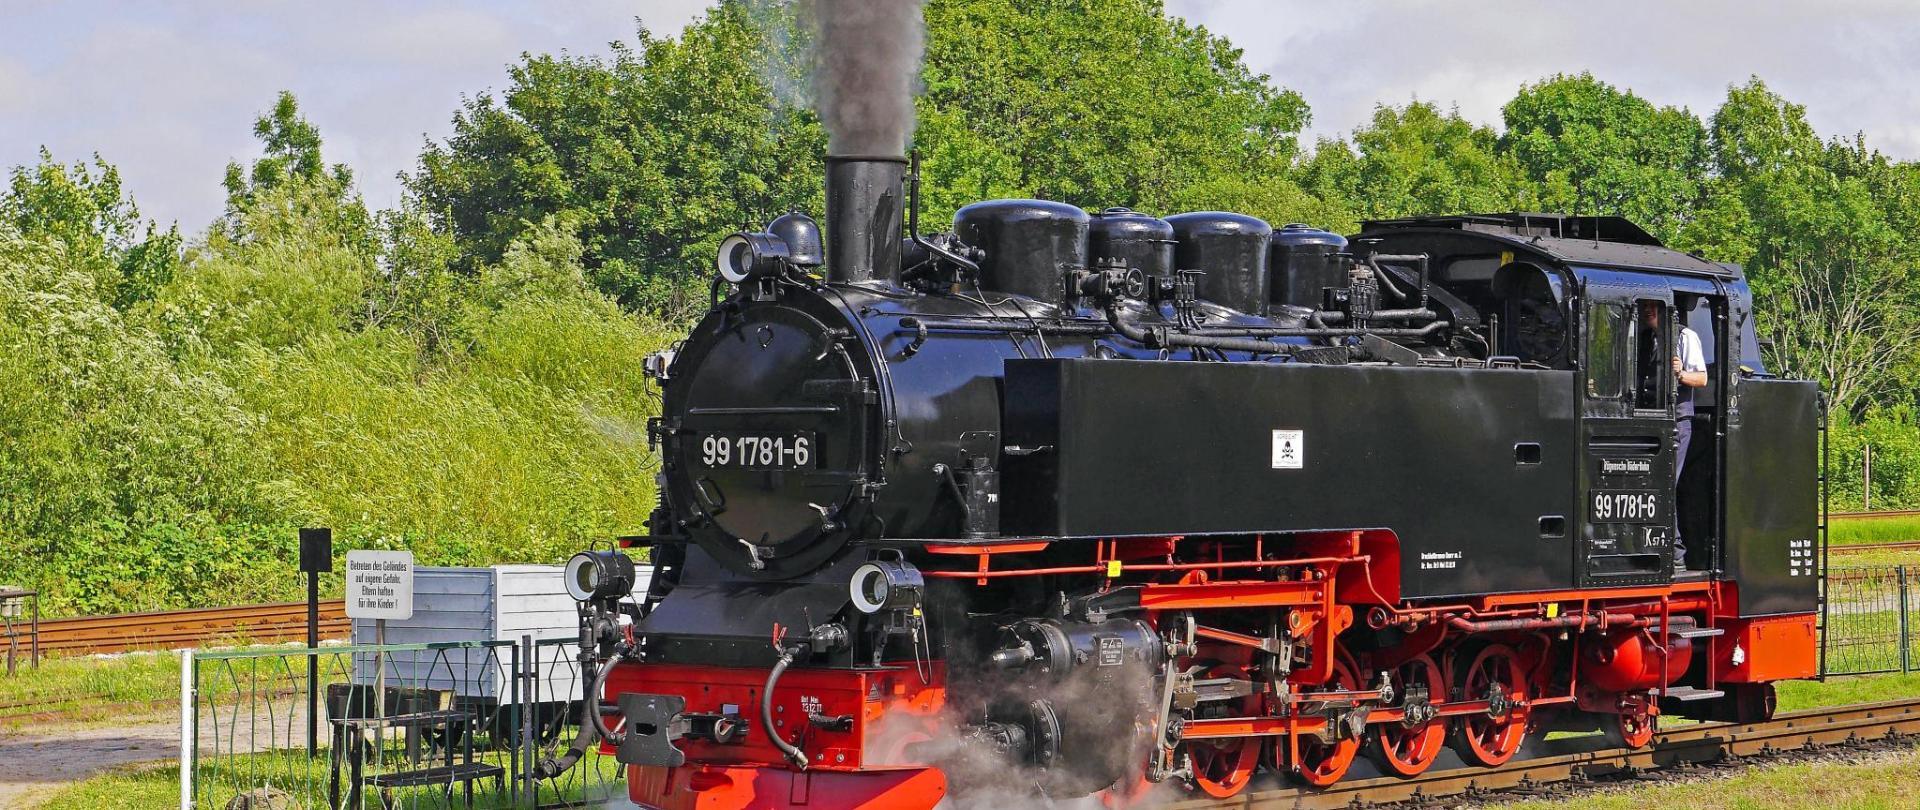 steam-locomotive-3827808.jpg